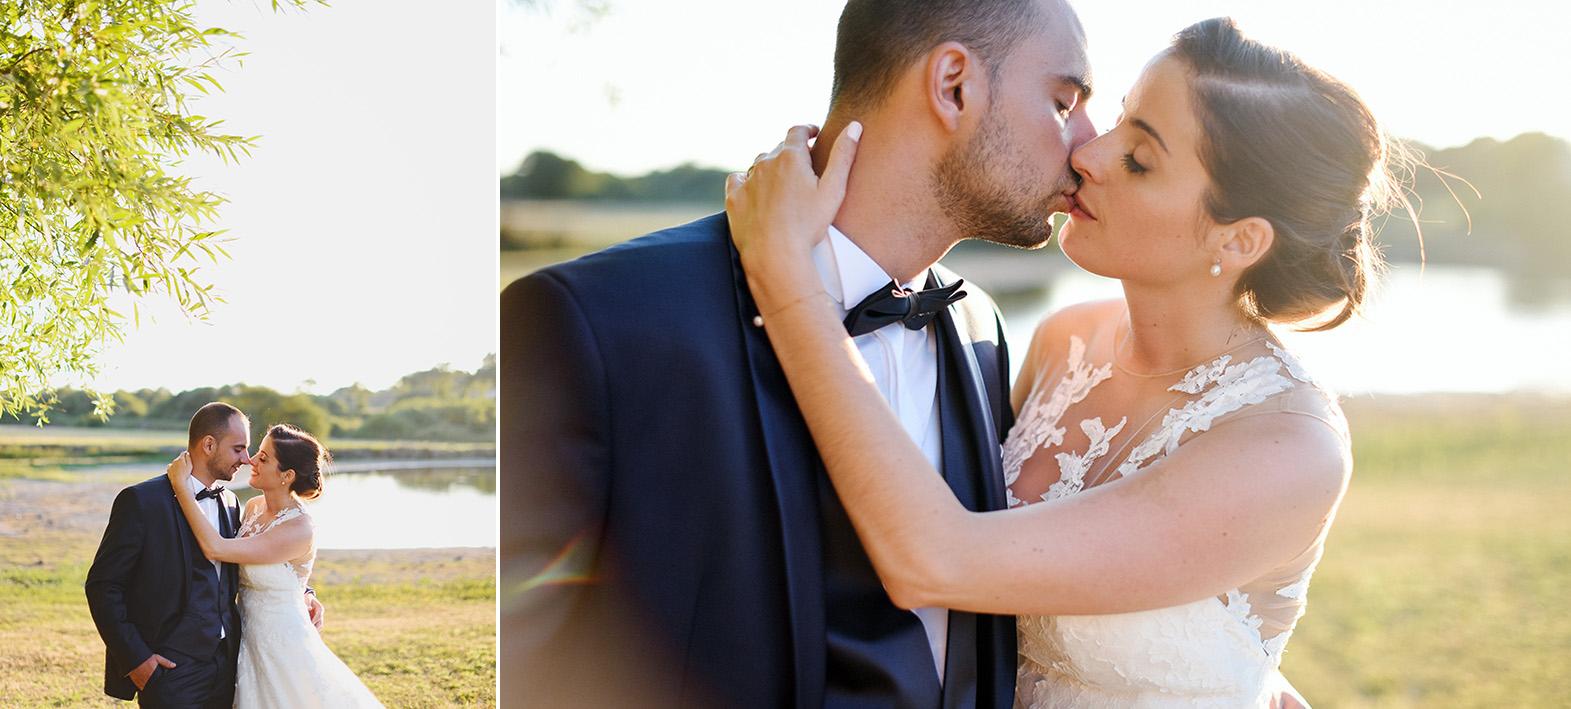 mariage_sj_manoir-de-kerbot_56_photographe_clemence_dubois-mep-7